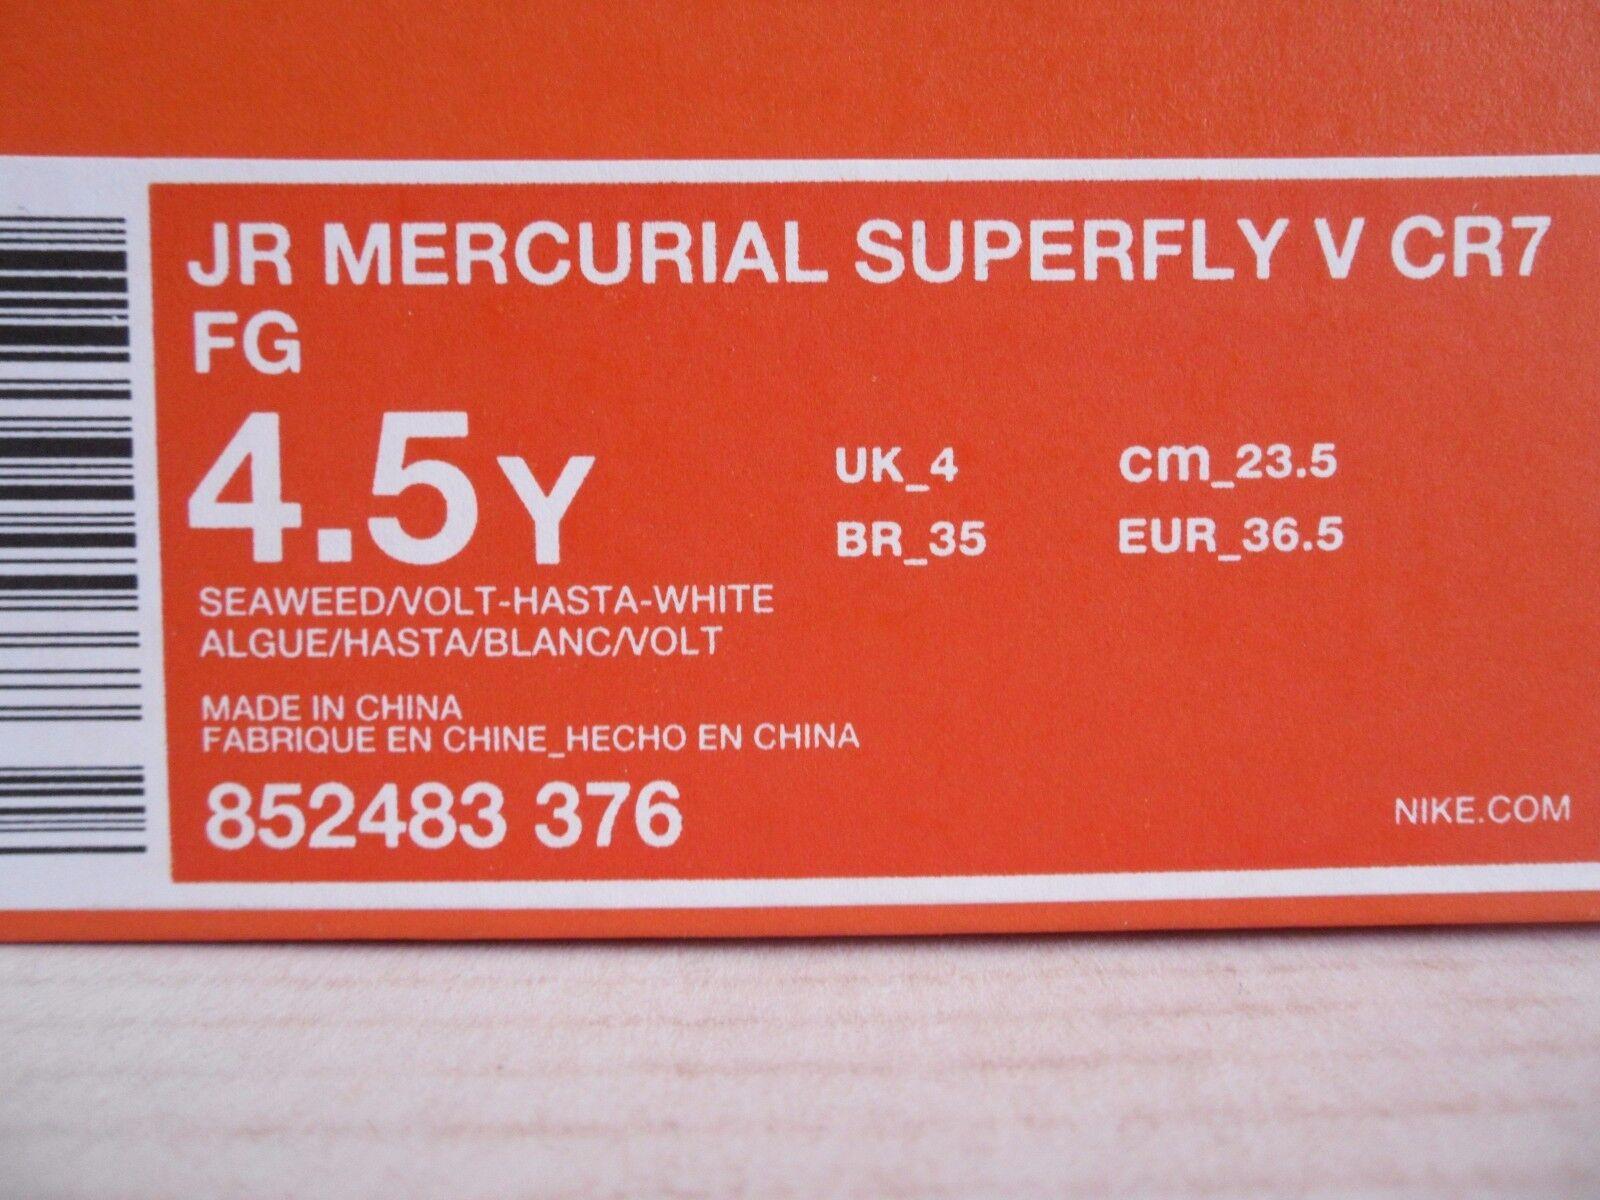 NIKE JR MERCURIAL SUPERFLY V CR7 FG SEAWEED SEAWEED SEAWEED SZ 4.5Y-WOMENS SZ 6 f665c2